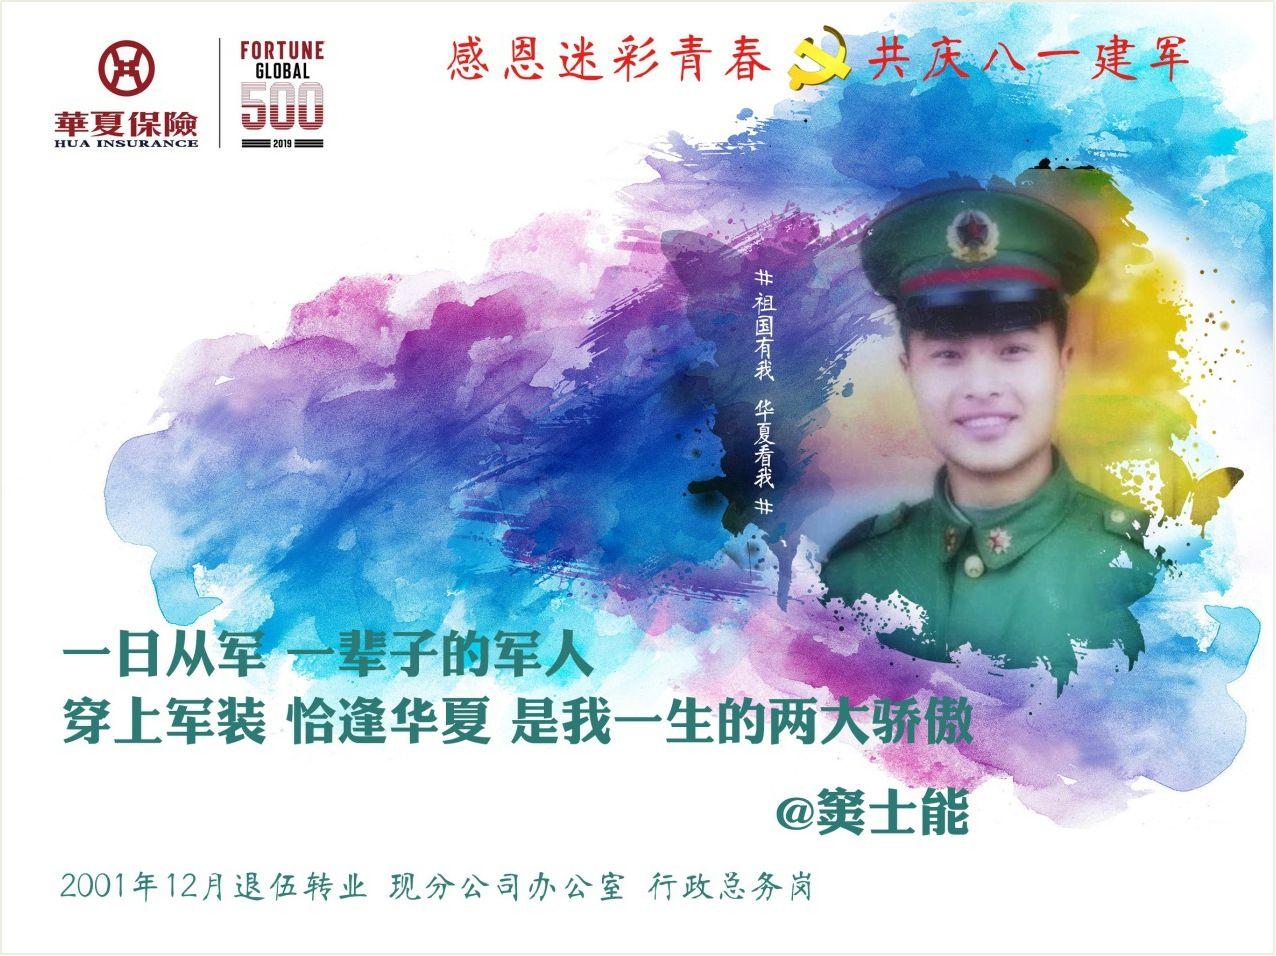 http://shanxigg.com/caijingjingji/1813275.html